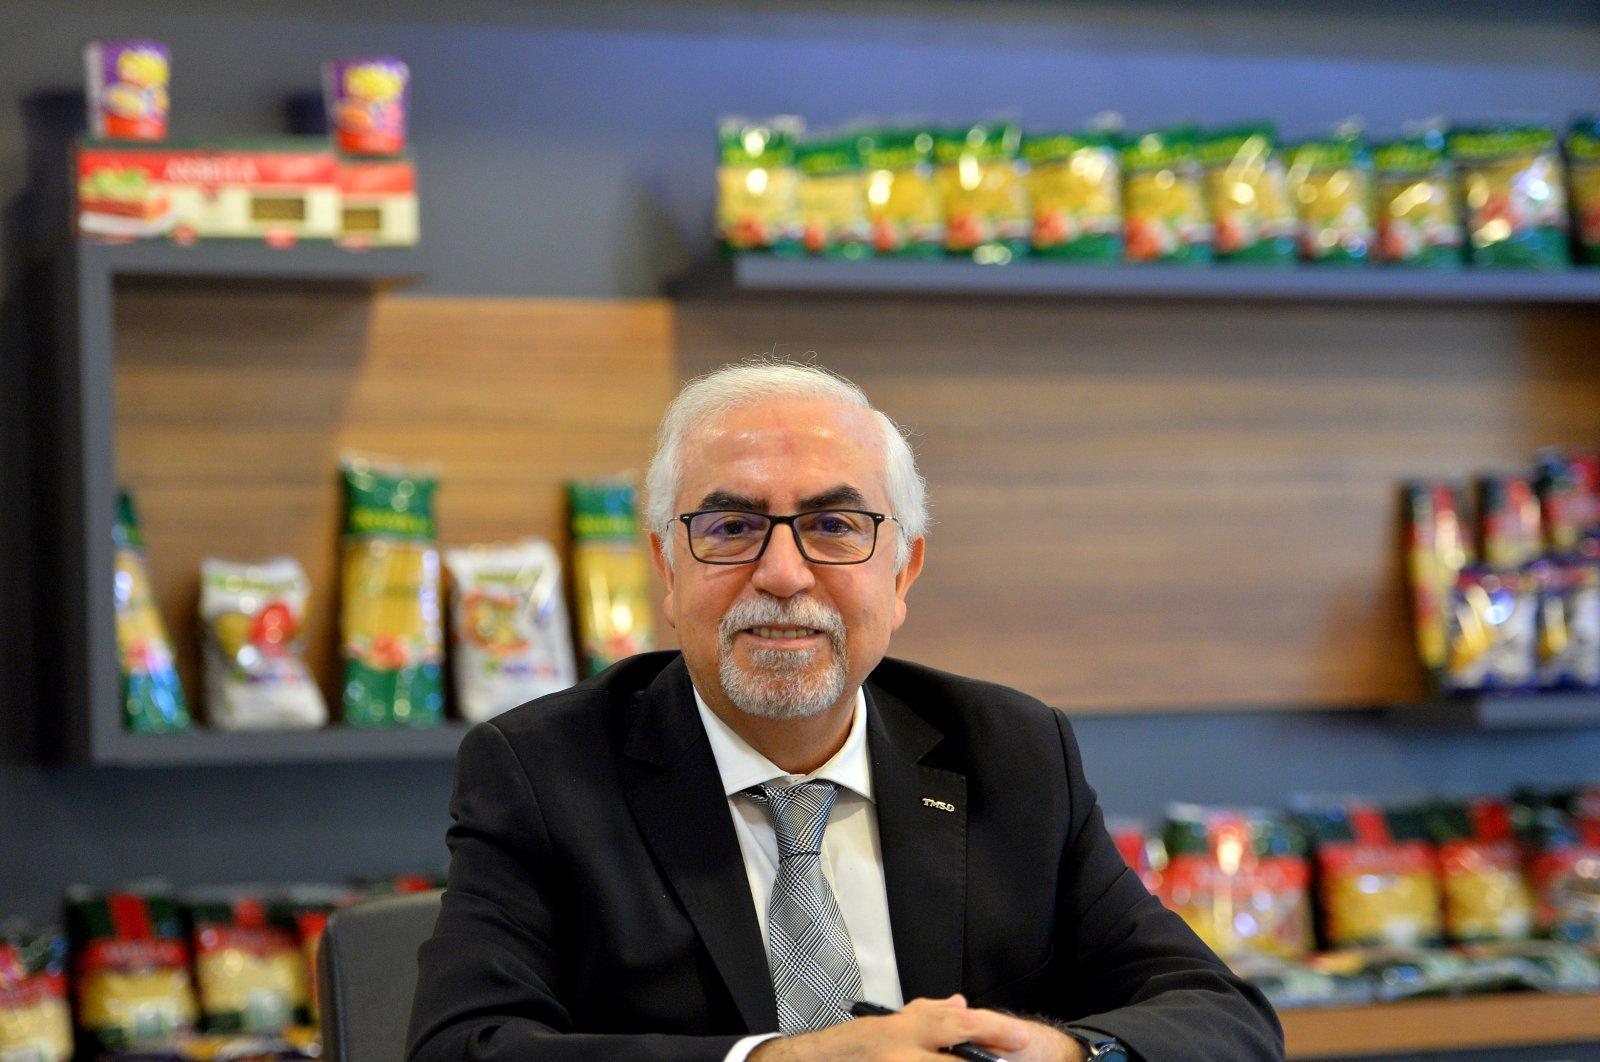 Abdülkadir Külahçıoğlu, the chairman of Pasta Industrialists Association of Turkey (TMSD), spoke to Anadolu Agency about the sector's export performance on May 24, 2020. (AA Photo)